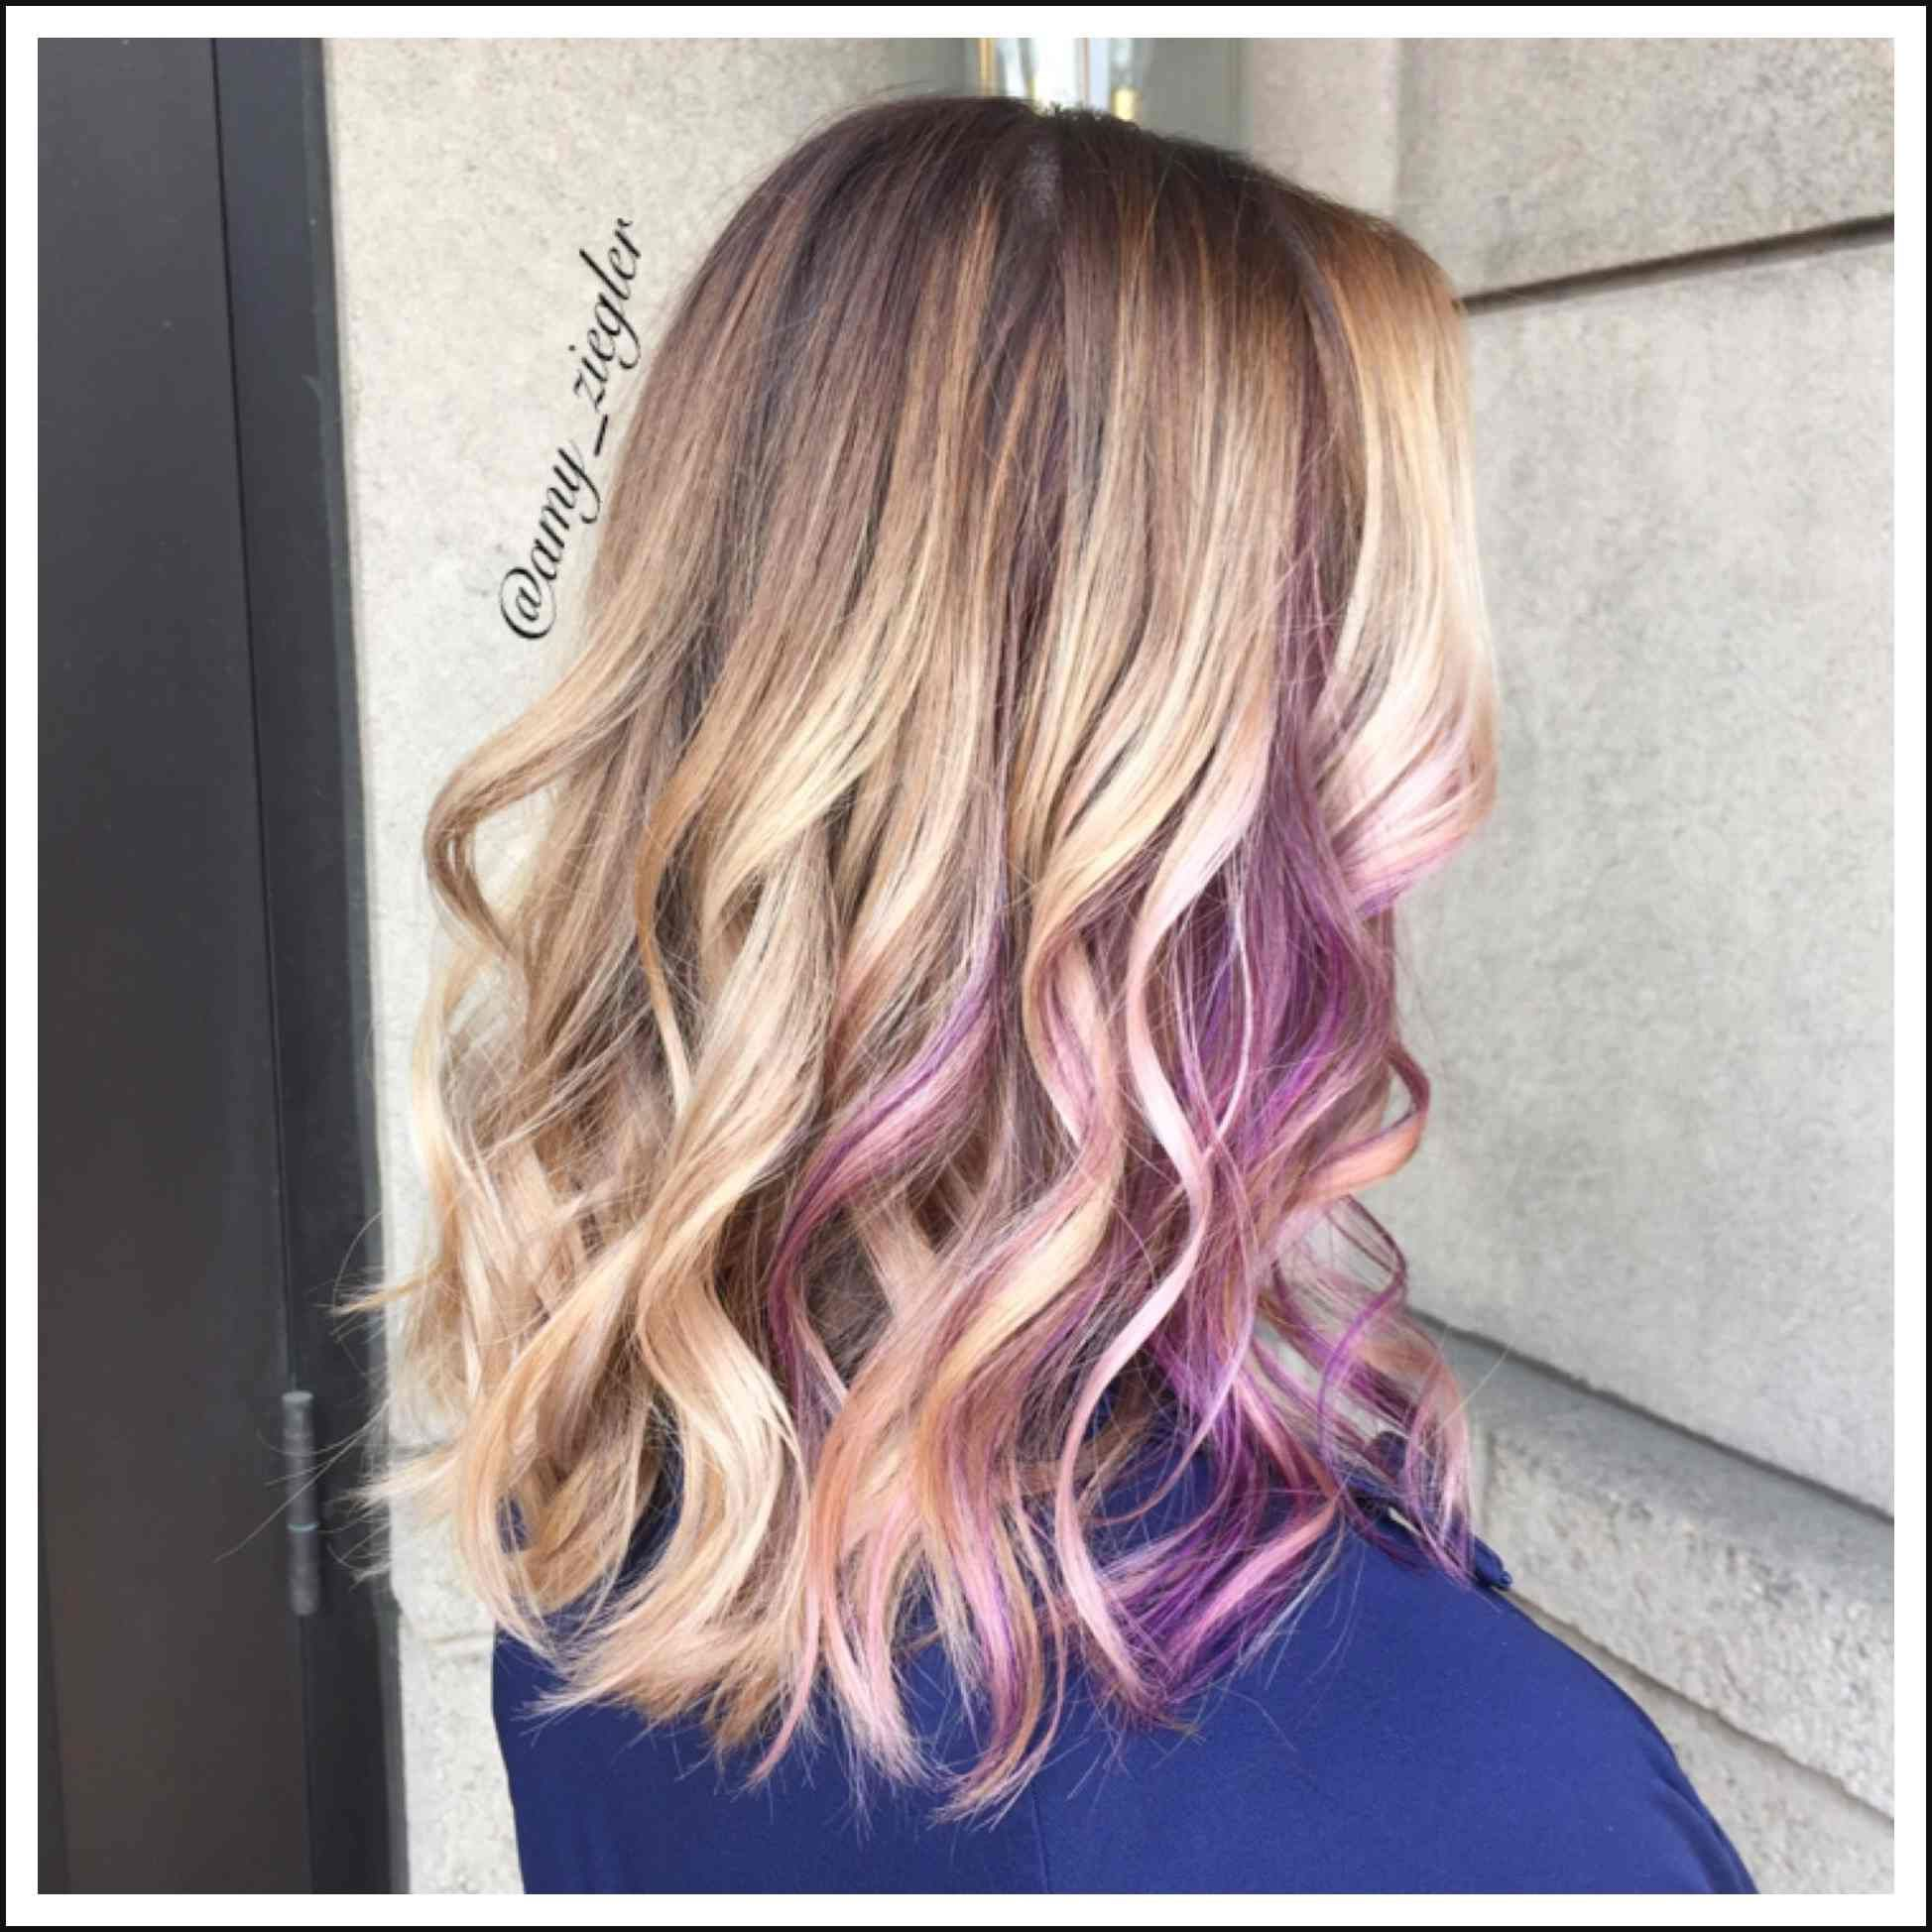 Blonde balayage and purple peekaboo by askforamy versatilestrands